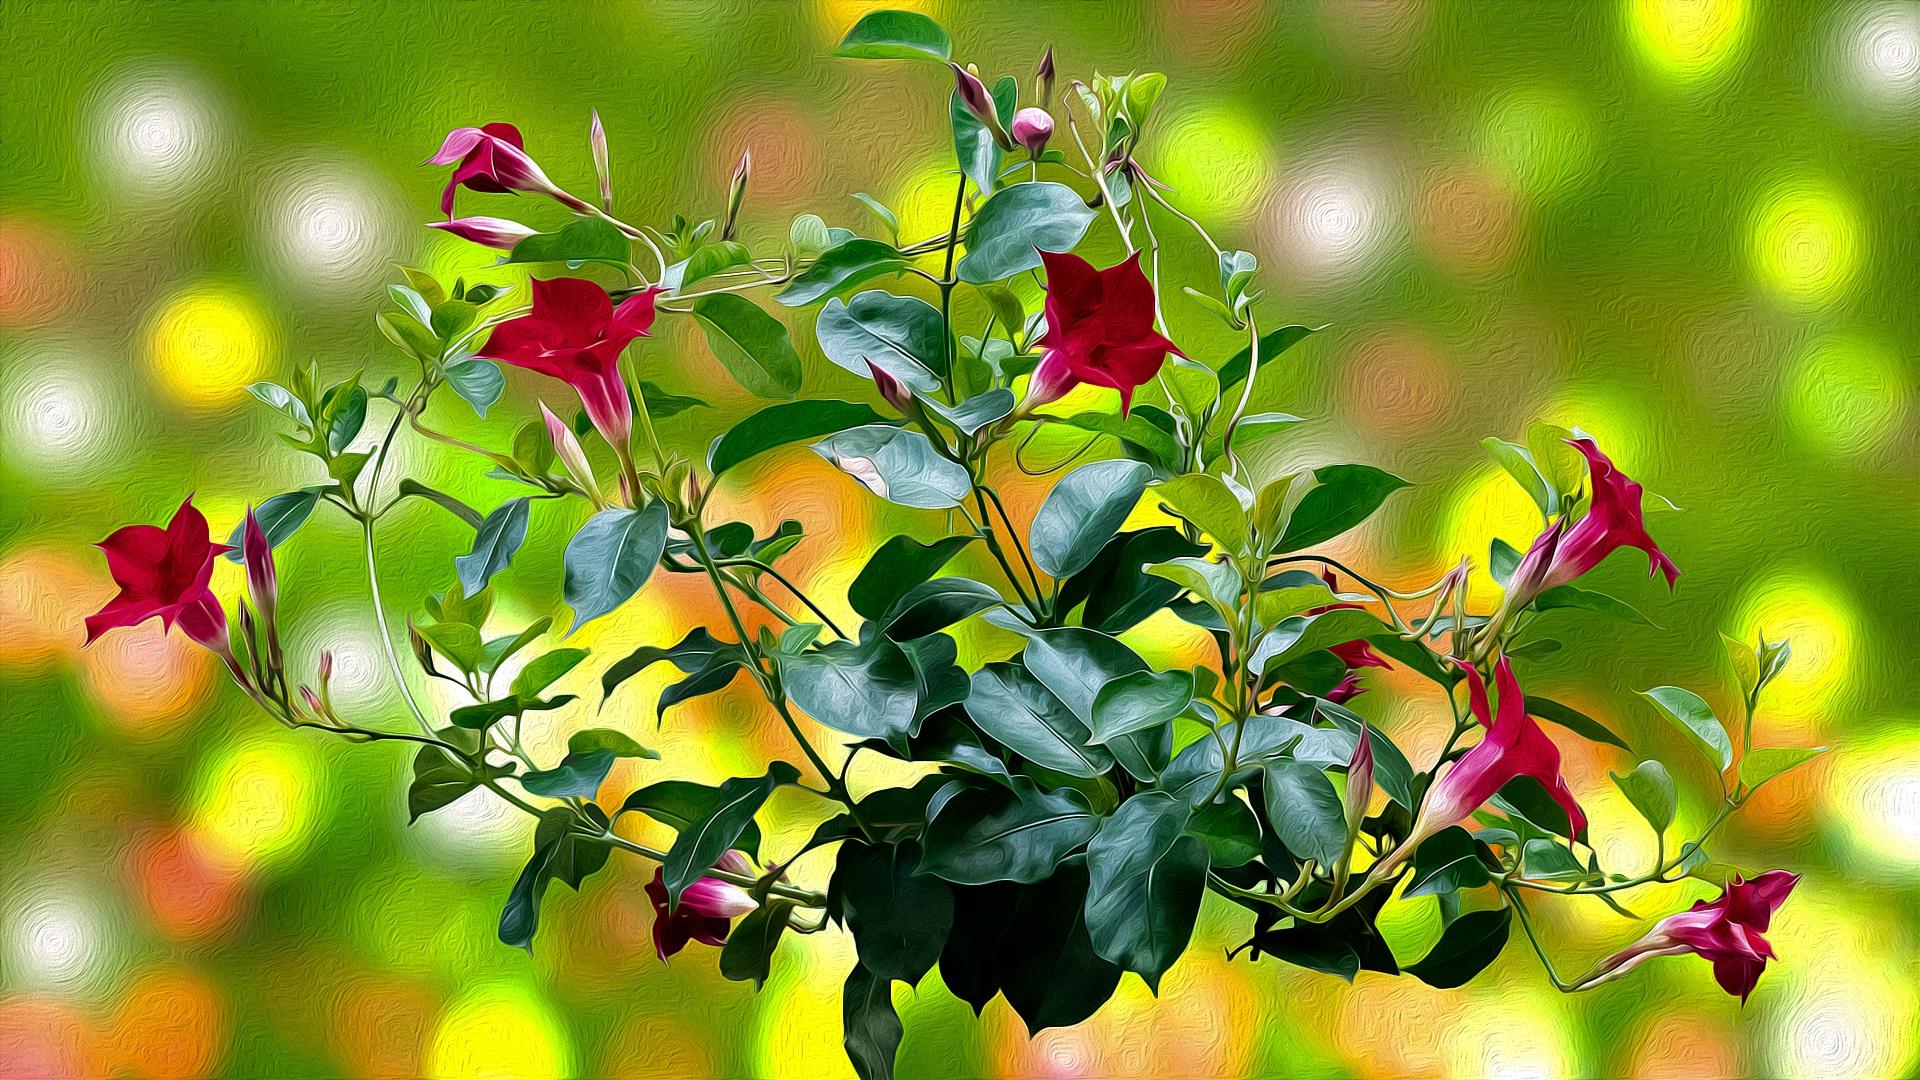 Flower 1920x1080